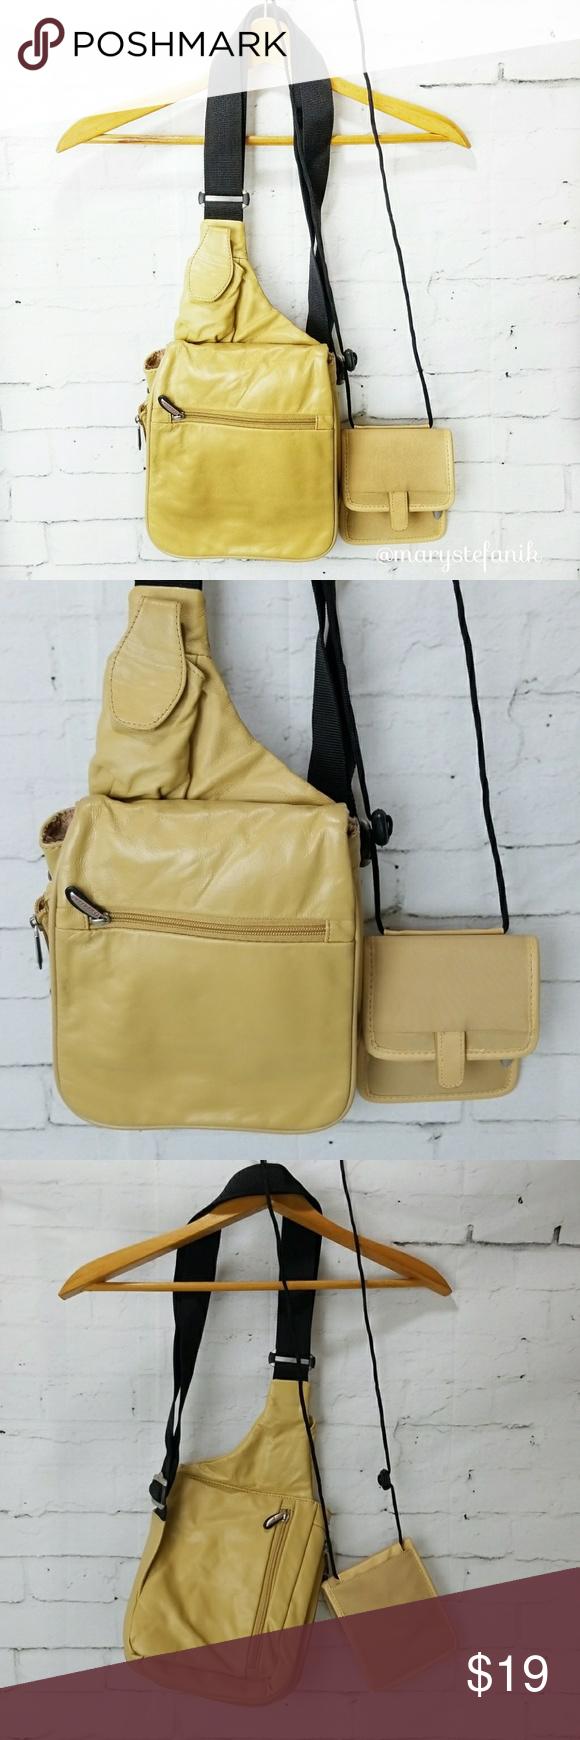 Cross Body Bags · Travelon Travel Easier Tan Leather Sling Bag Set Travelon  Travel Easier Tan Leather Sling Bag Set 8ae9dc17f3